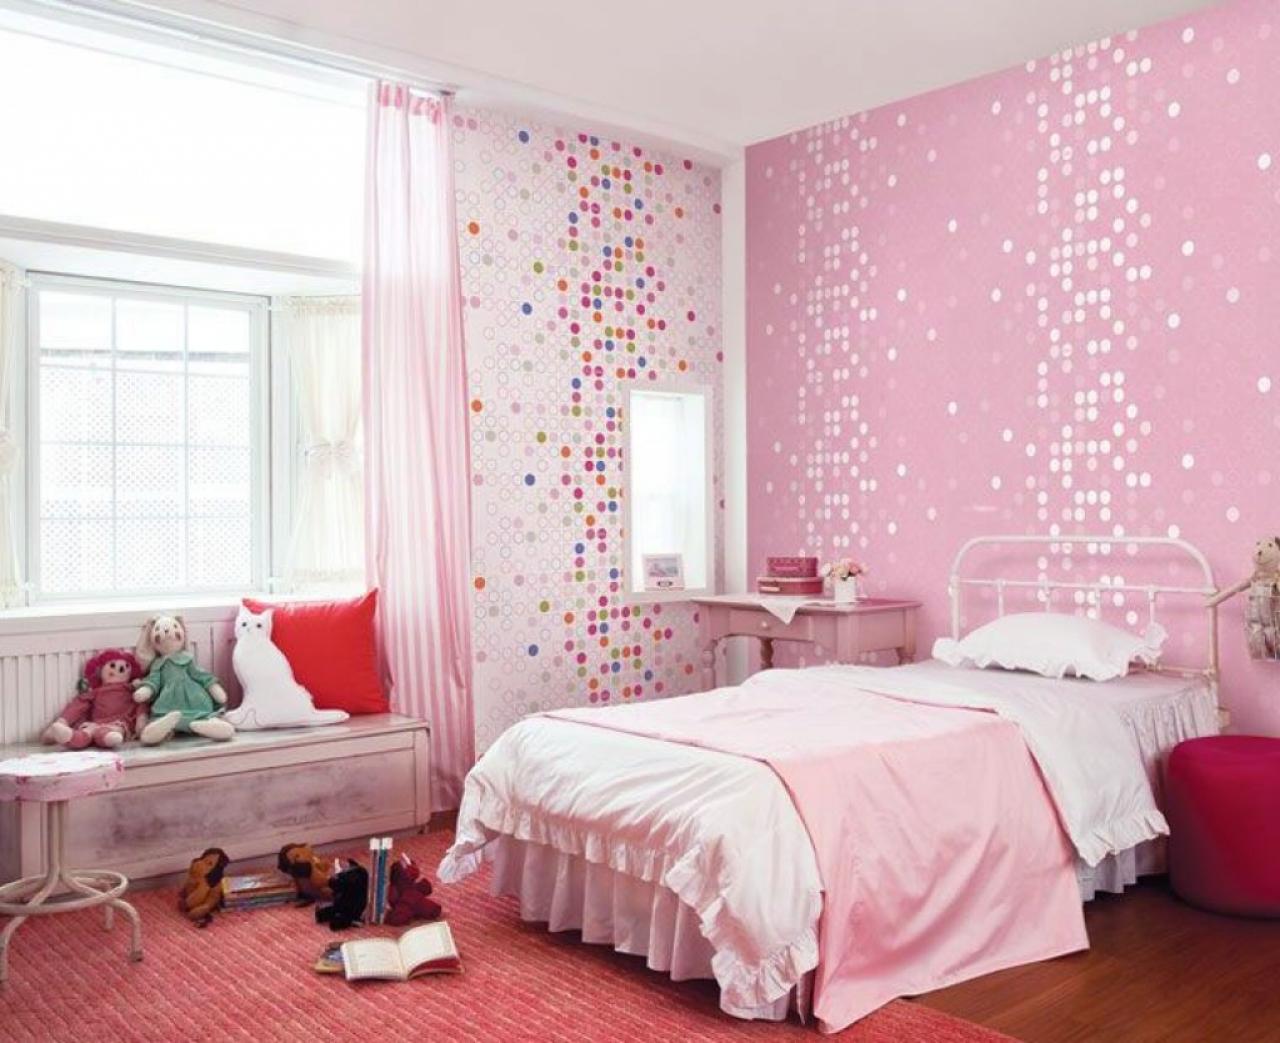 46+] Cute Wallpapers for Teenage Girls on WallpaperSafari